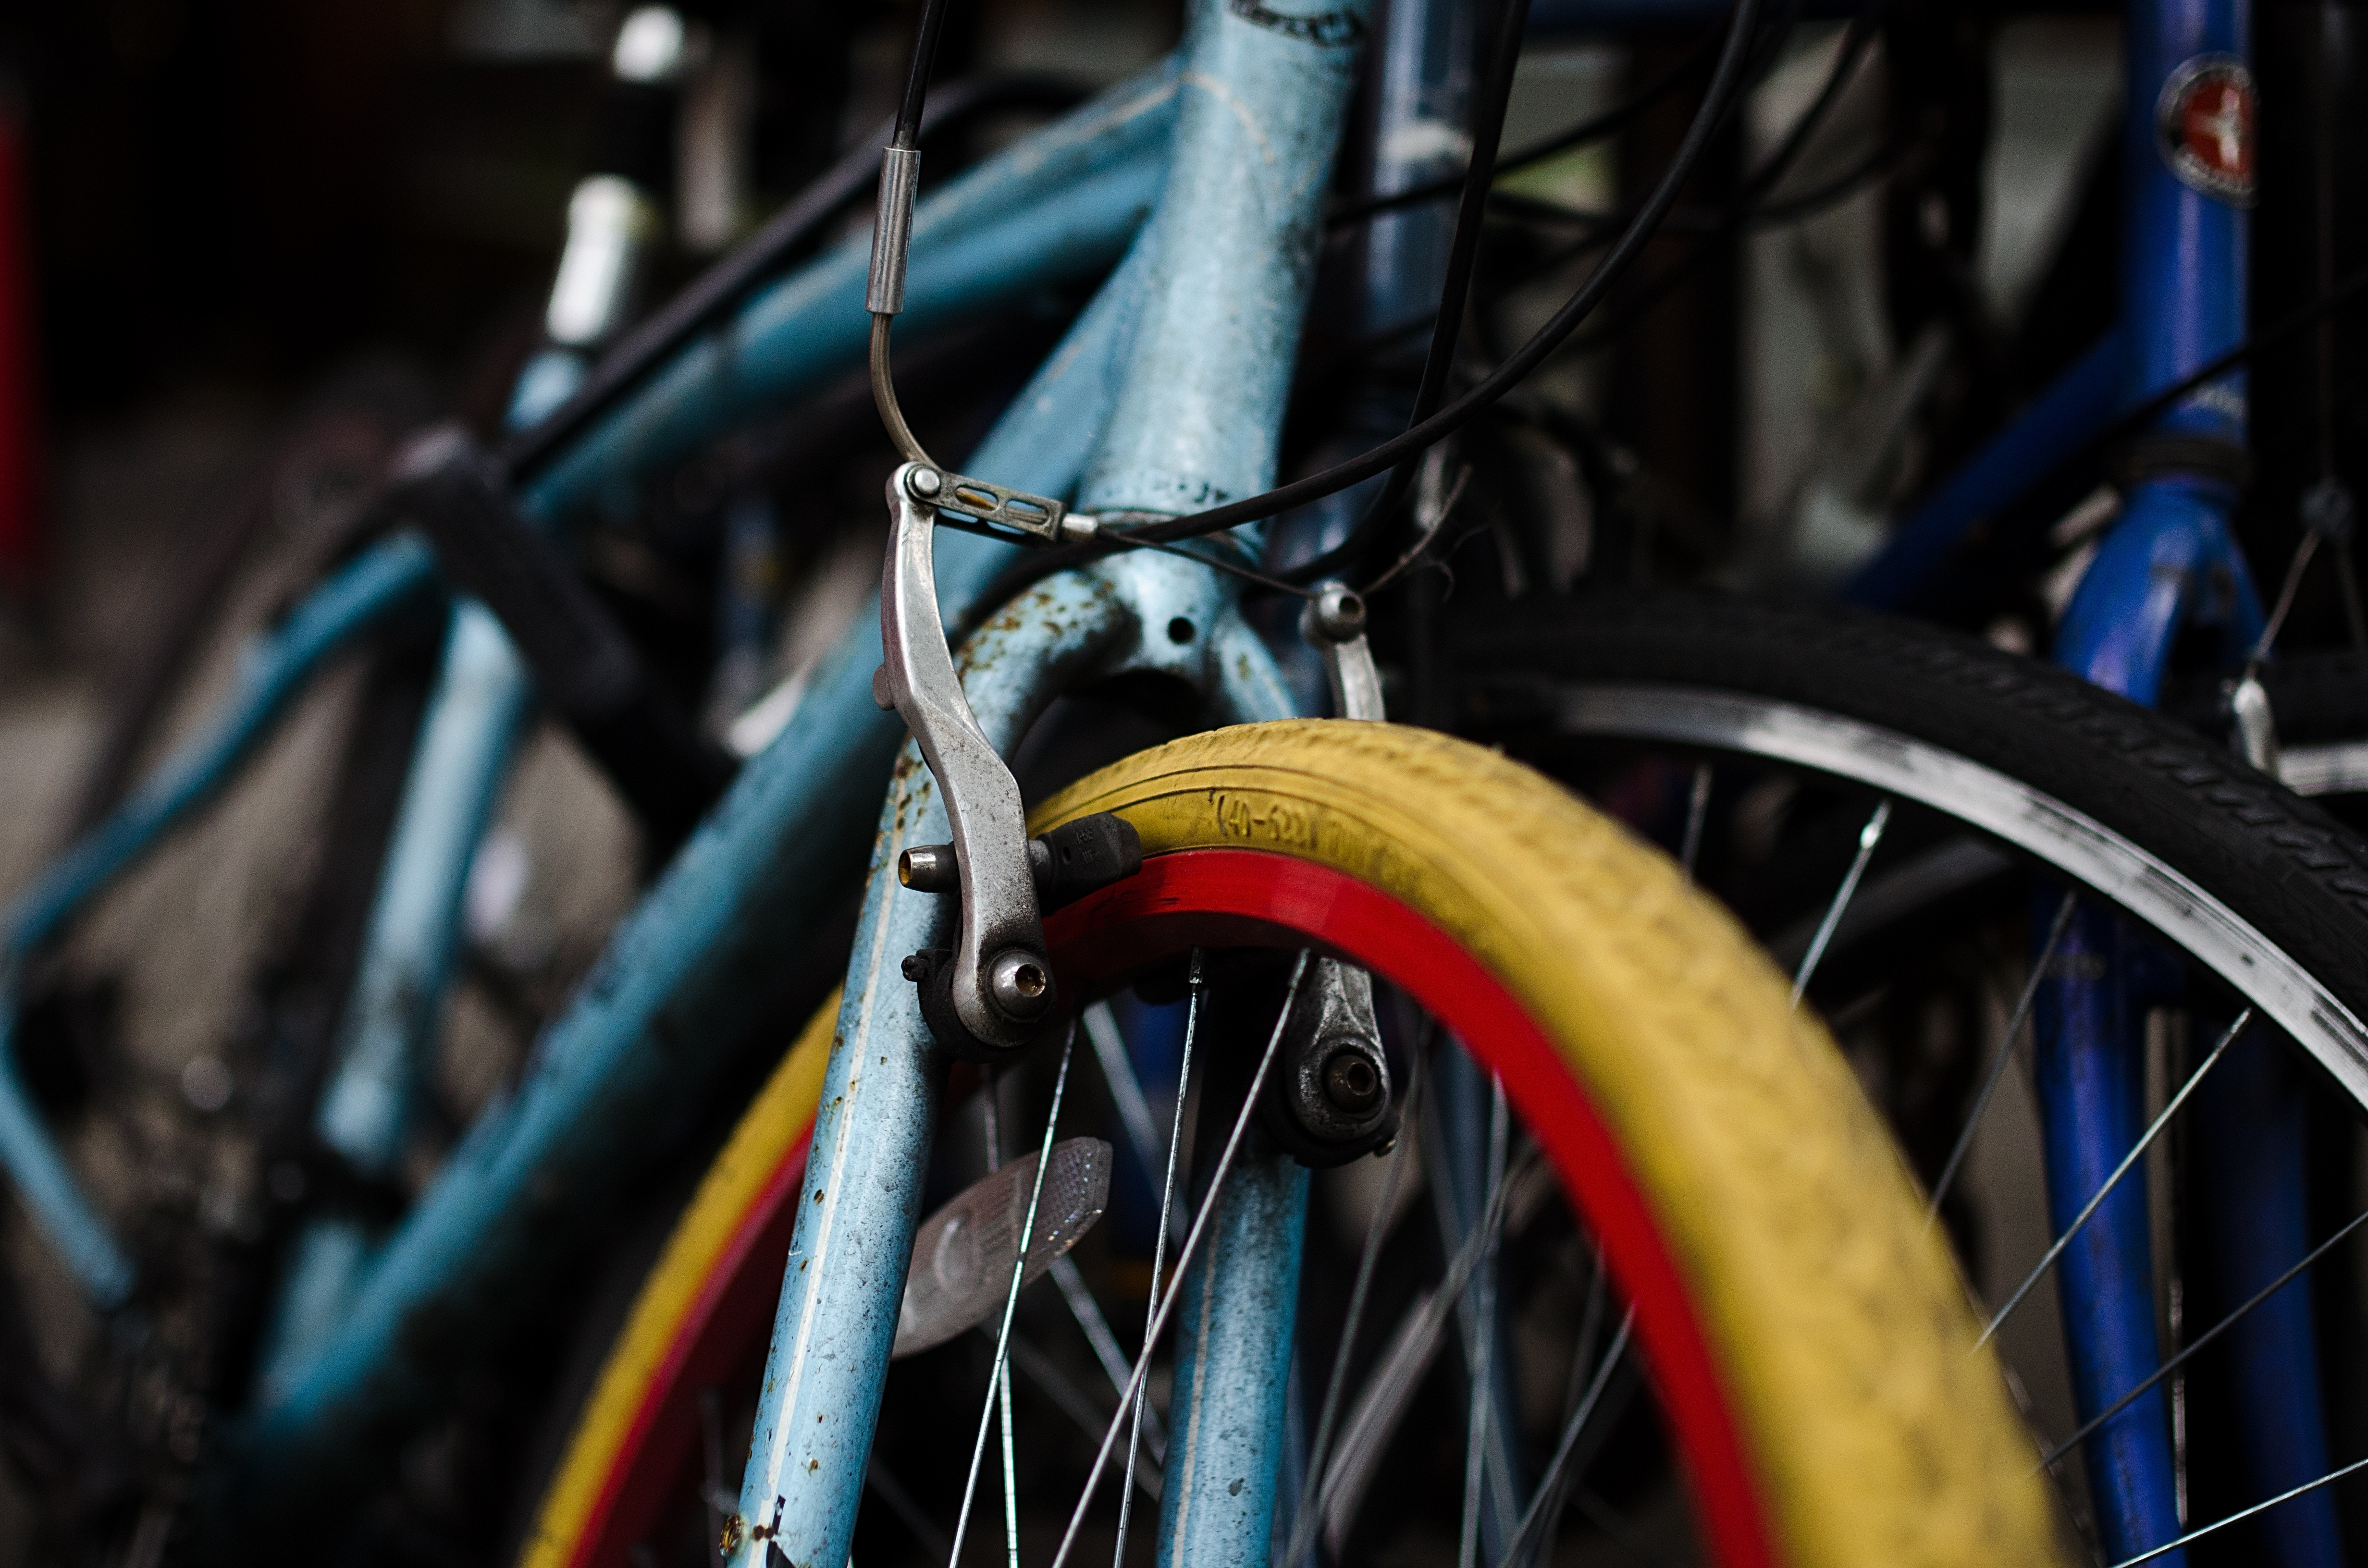 Opis in sestava kolesa